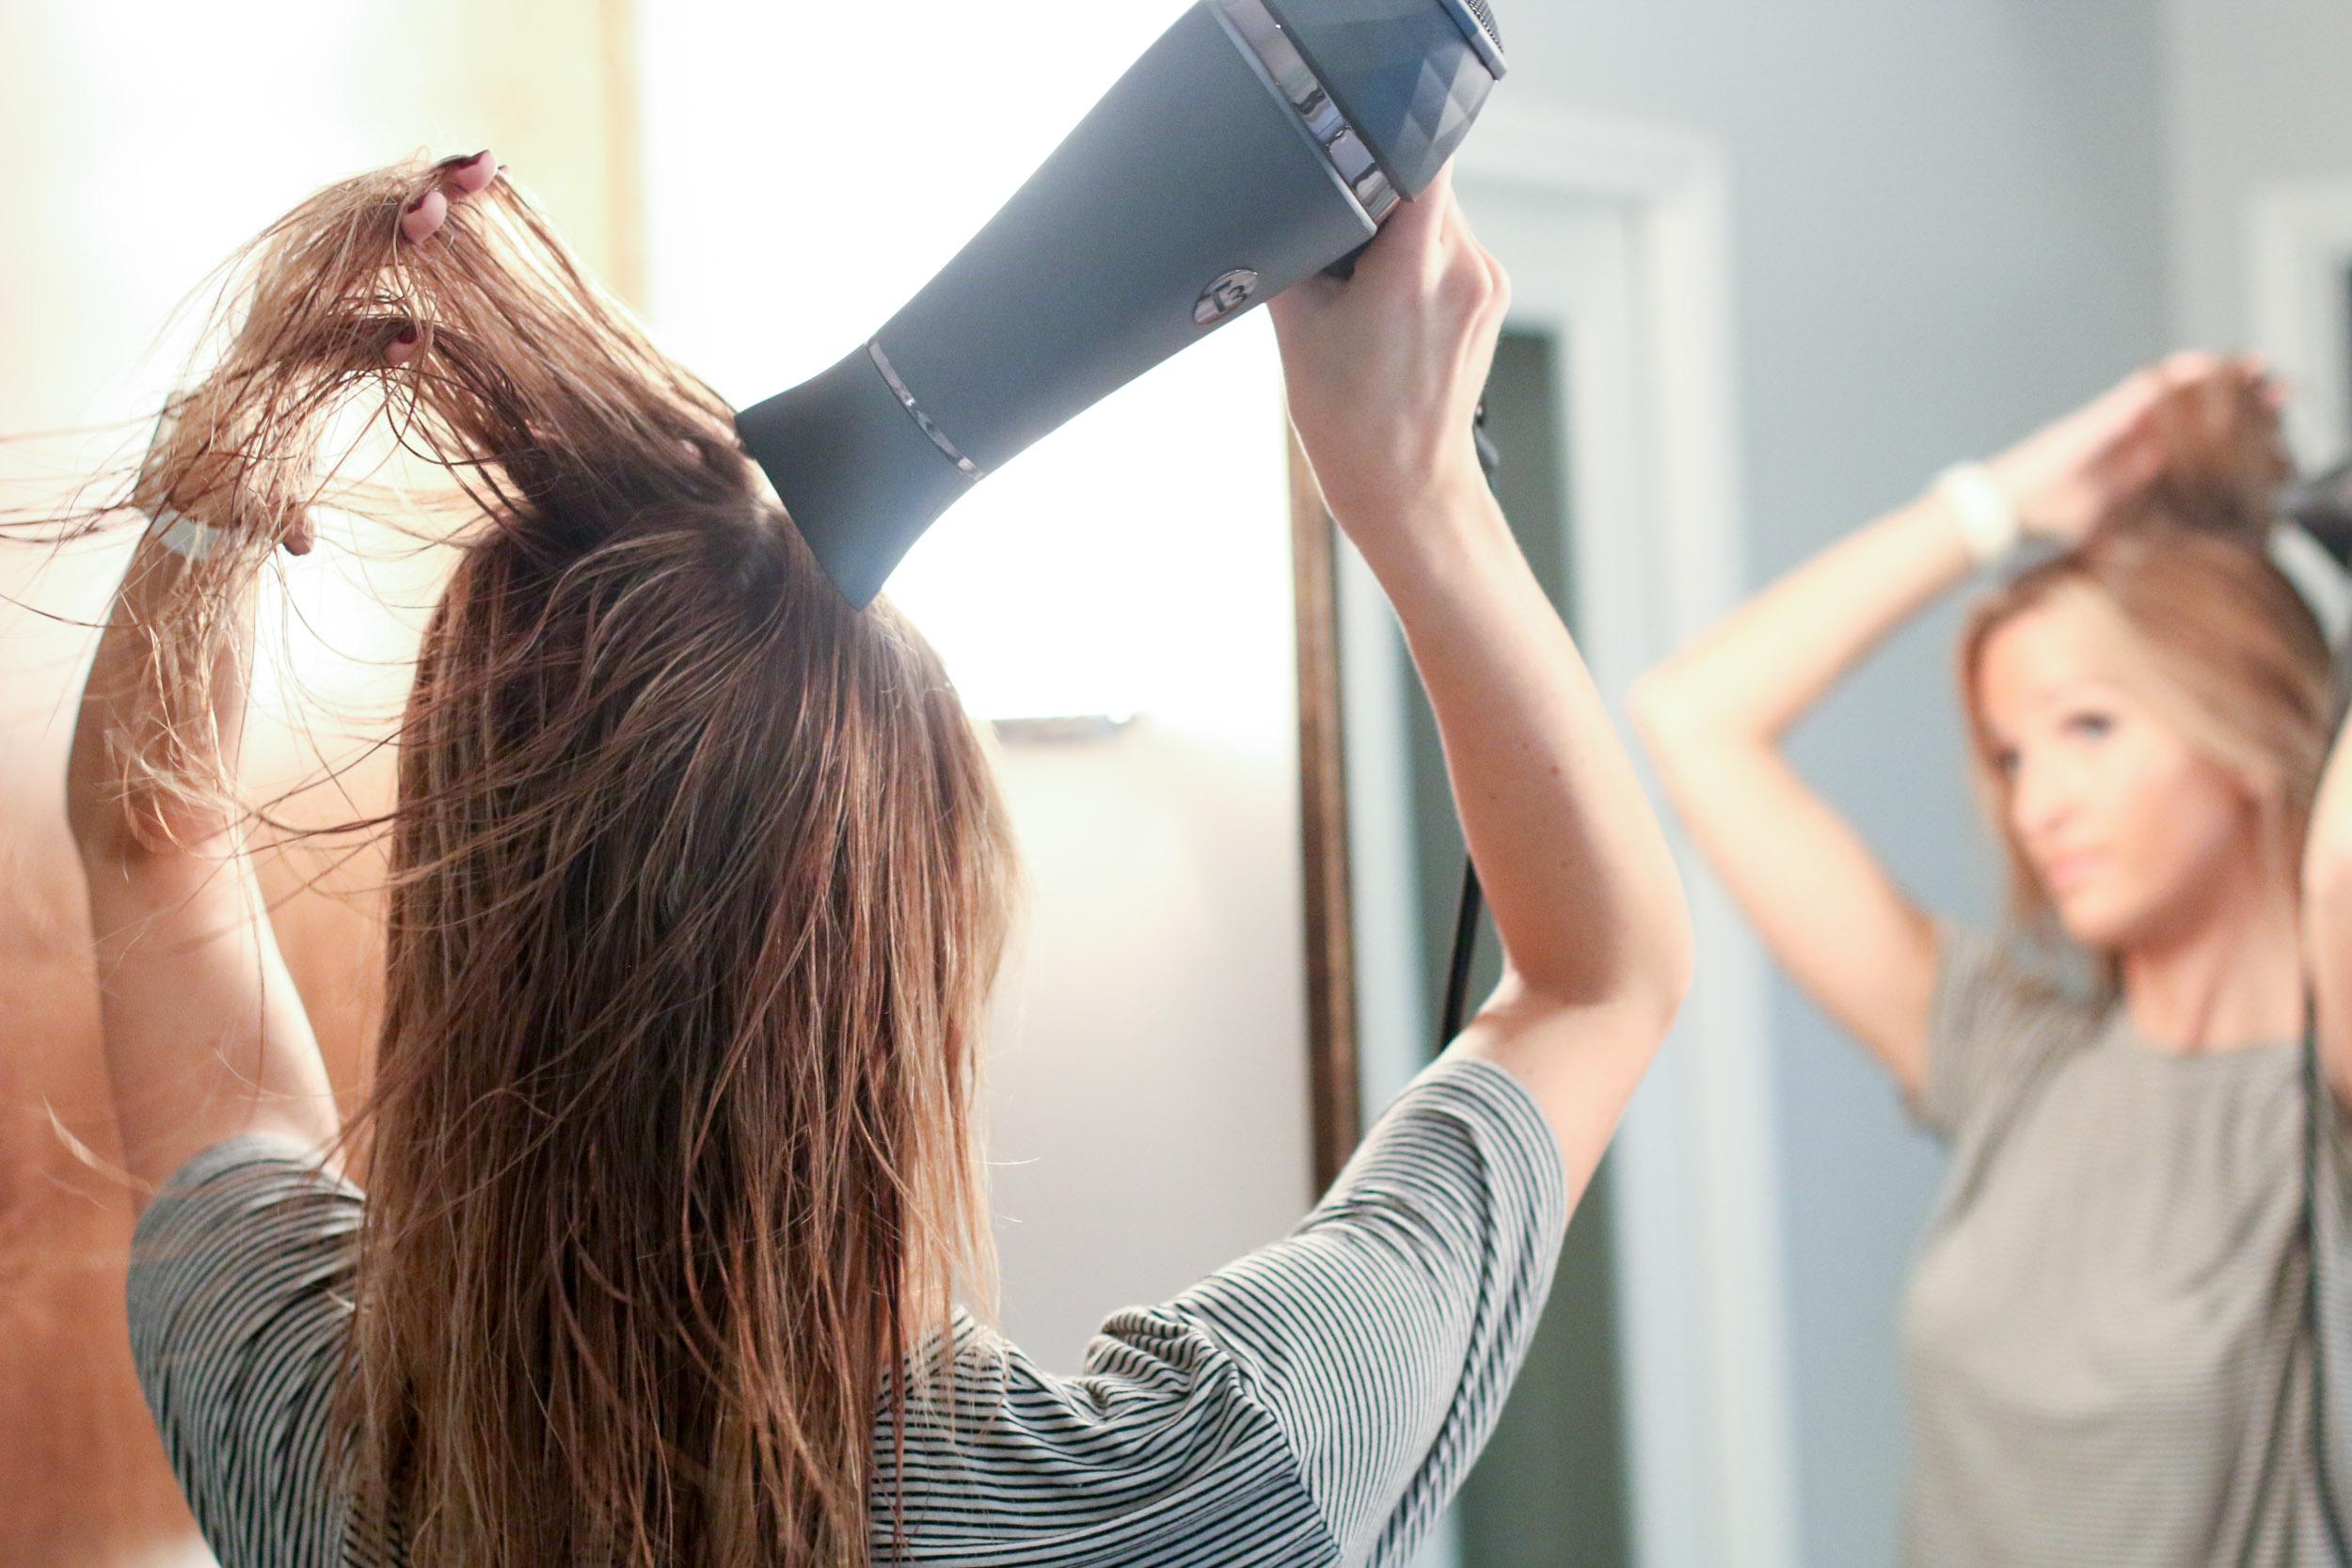 capelli asciugati bene Tangle-Free-Hair-–-Attractive-as-well-as-Essential-12